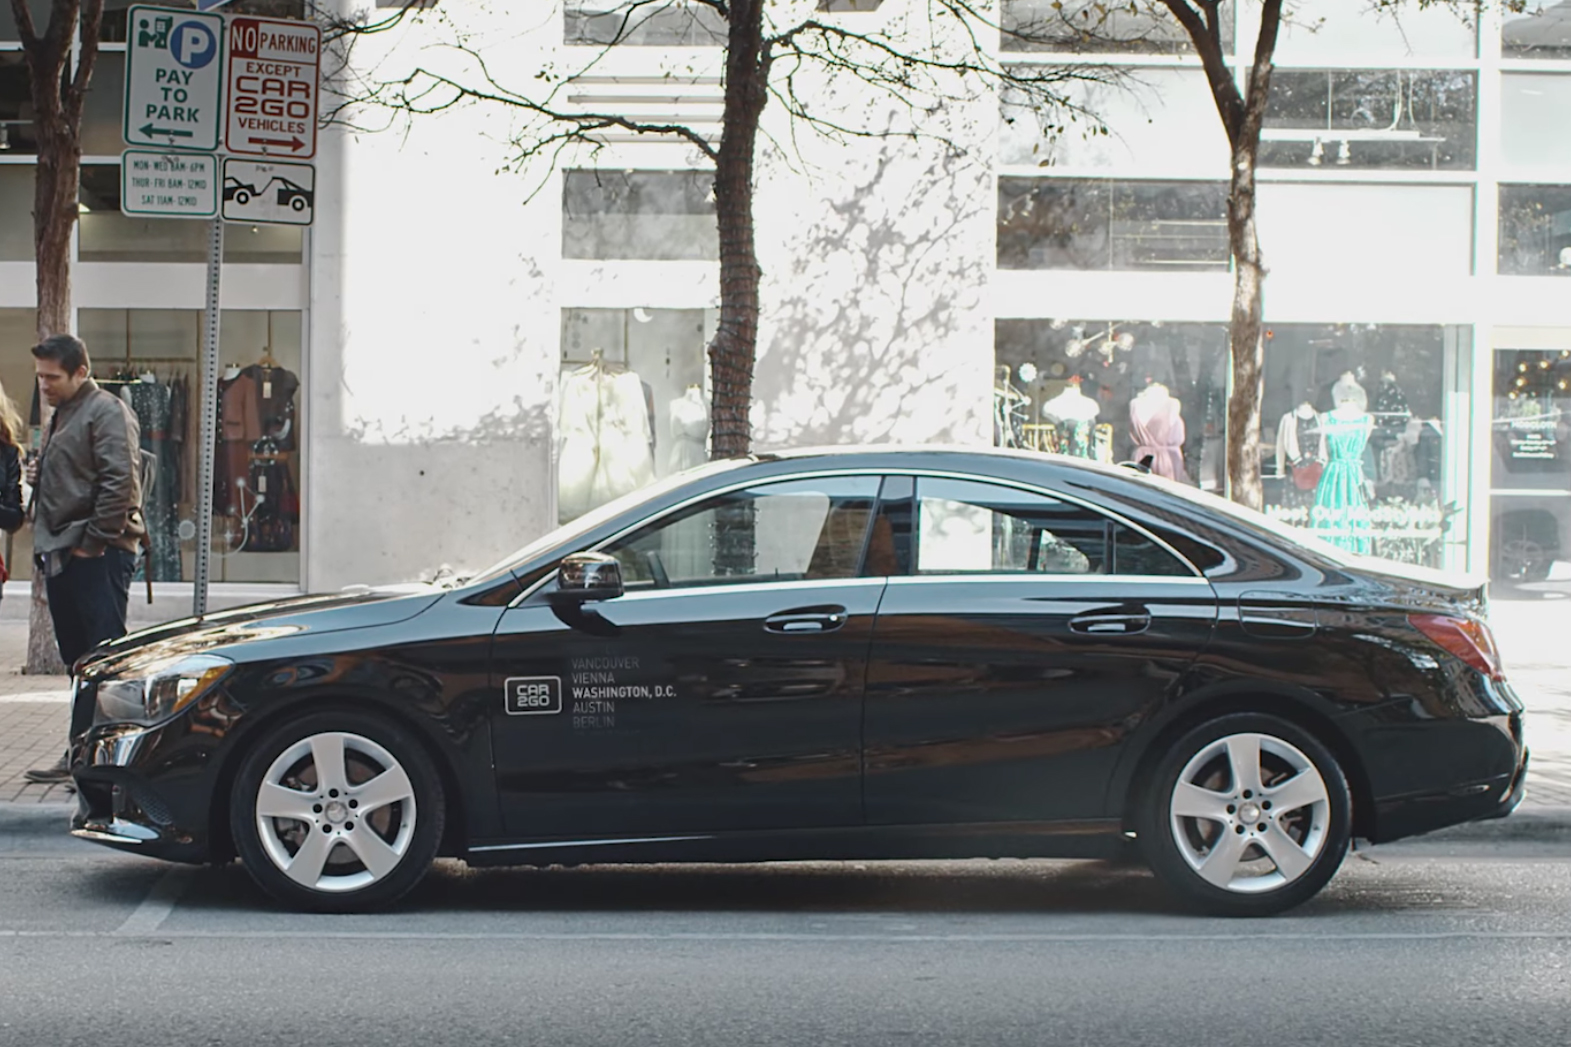 Car-sharing app Car2go investigating potential fraud in Chicago